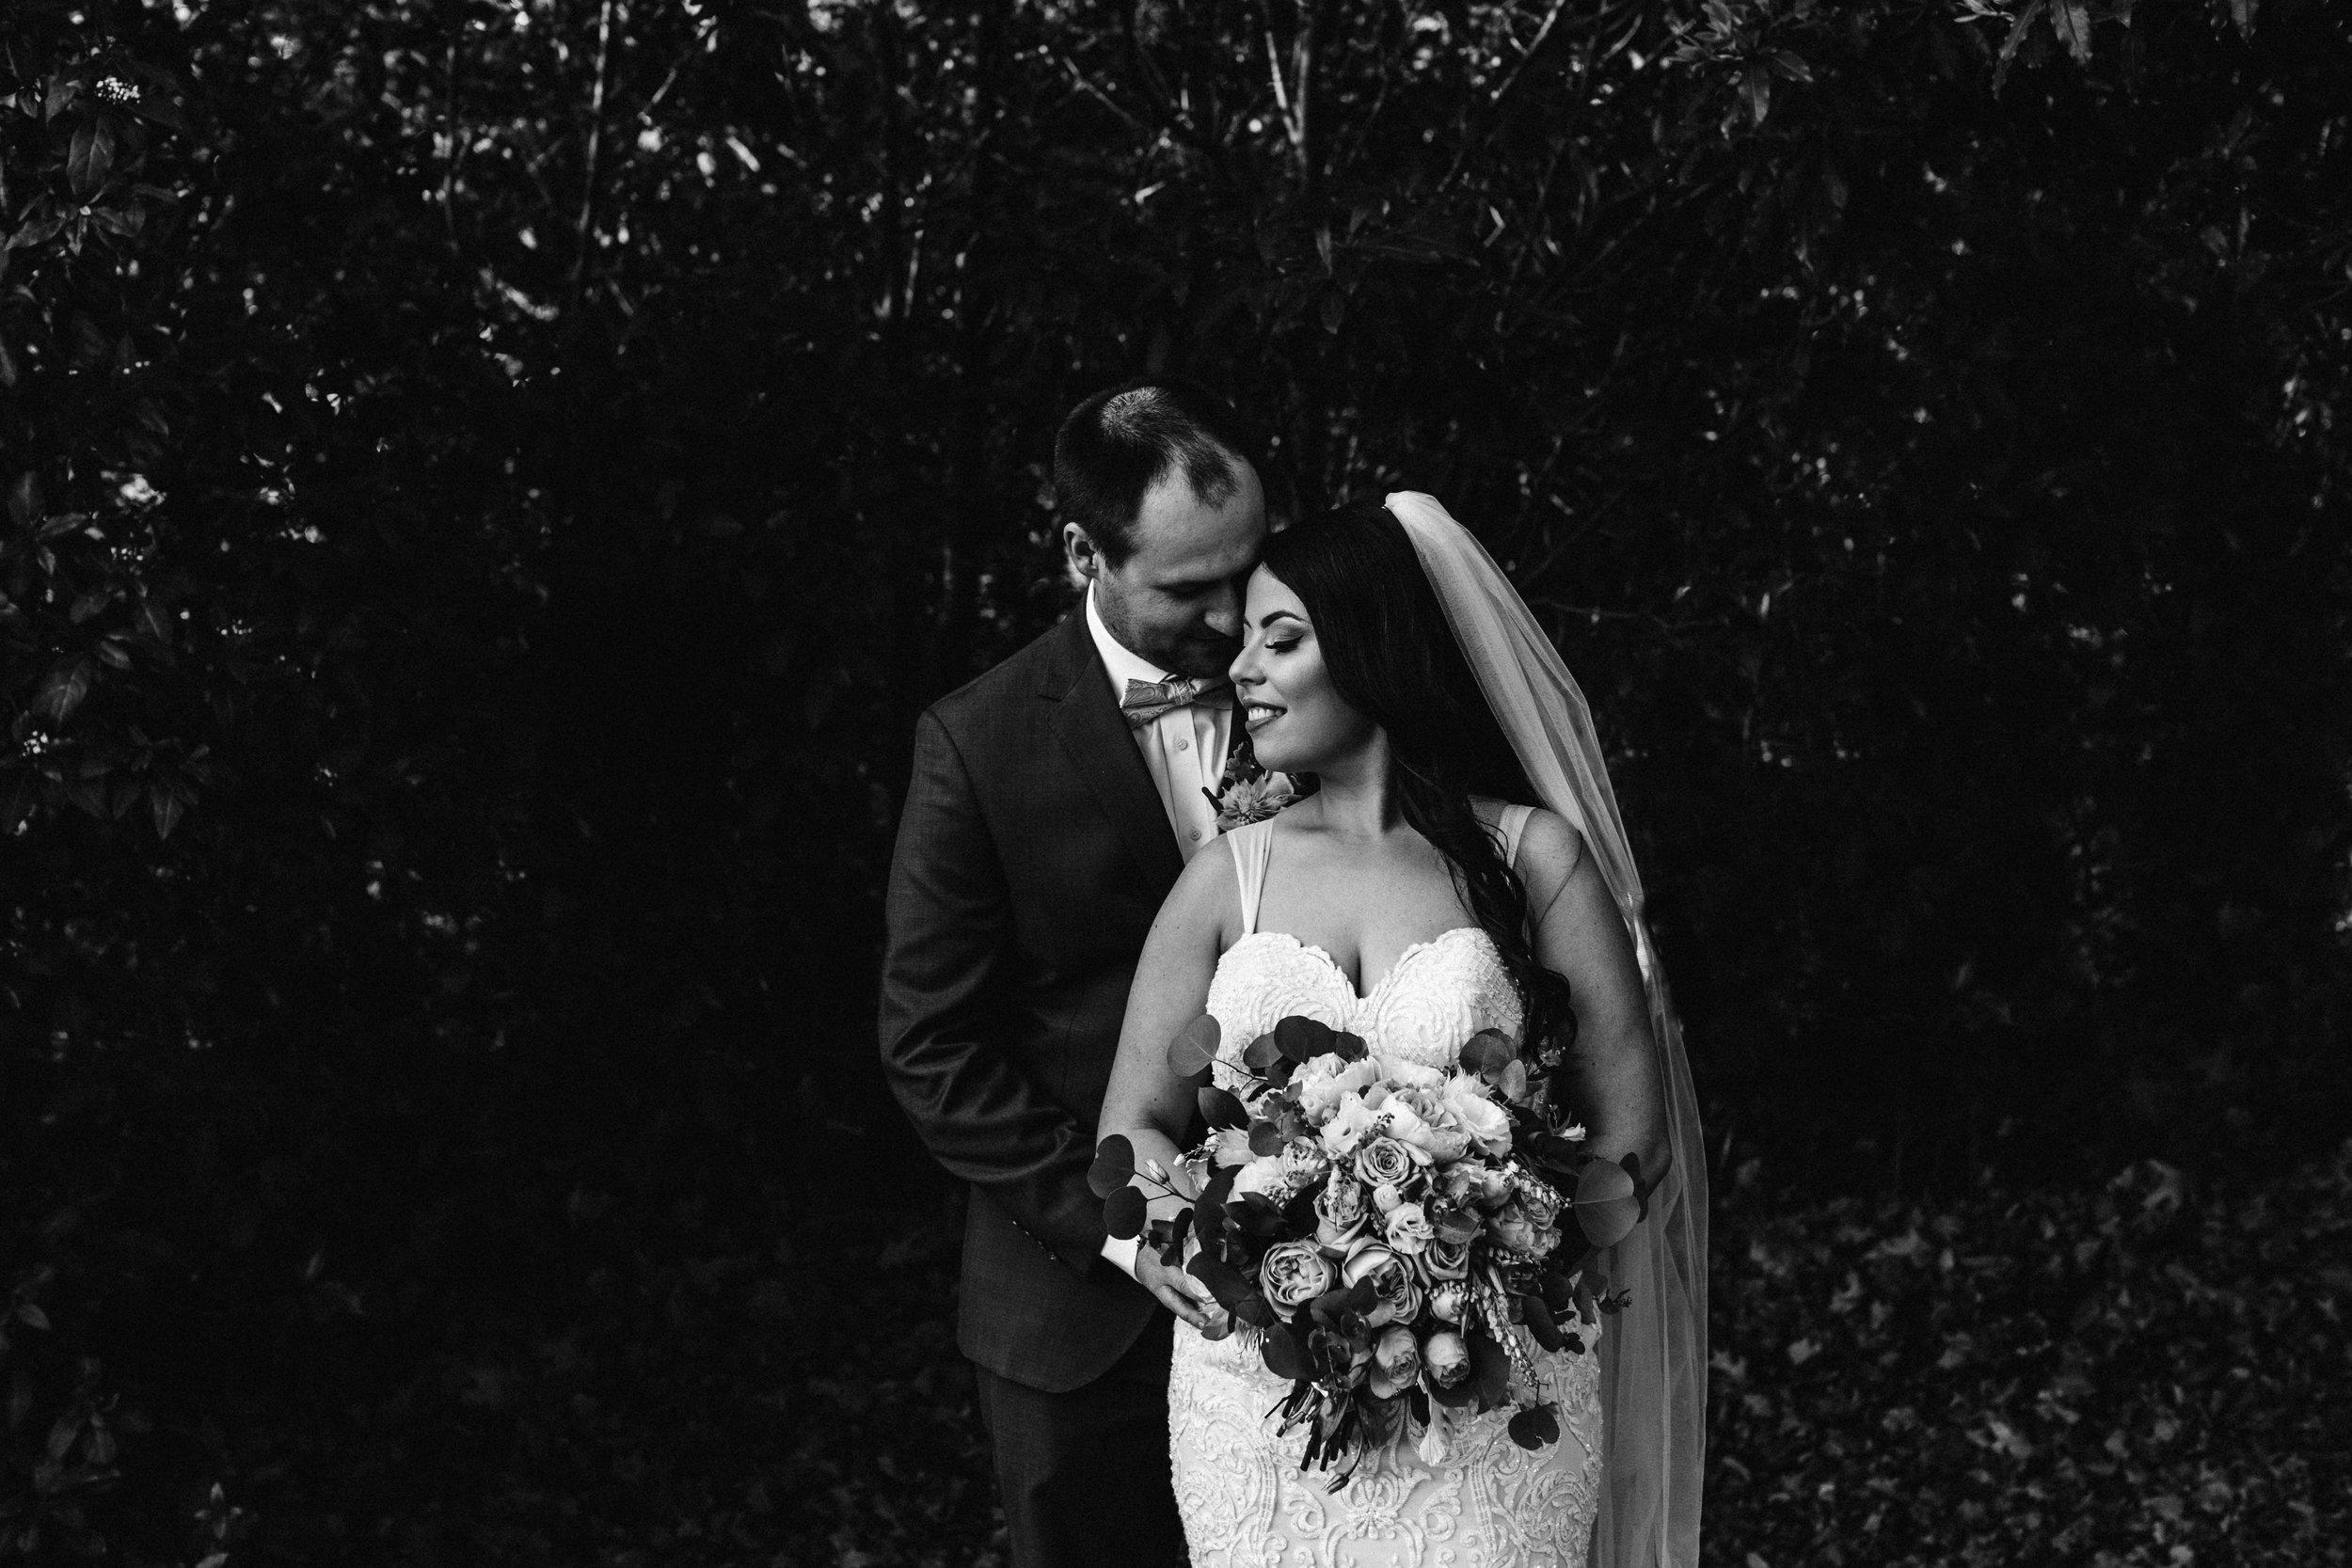 exeter-southern-highlands-wedding-www.emilyobrienphotography.net -103.jpg